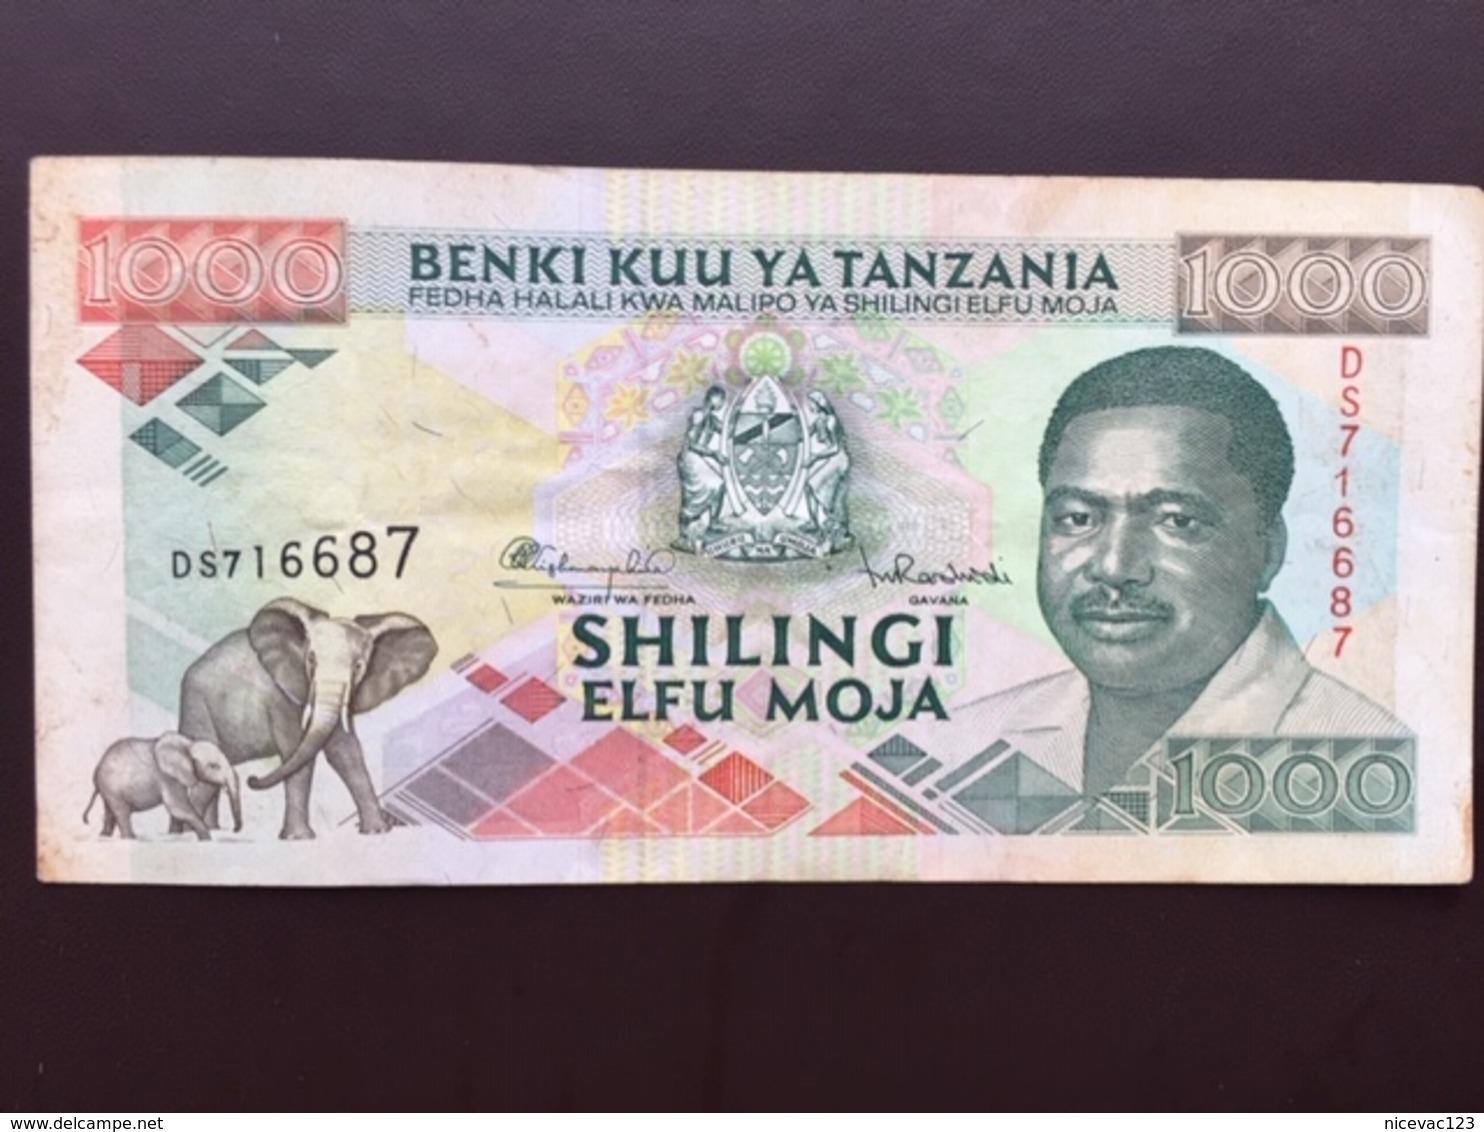 TANZANIA P27 1000 SHILINGI ND 1993 VF - Tanzanie